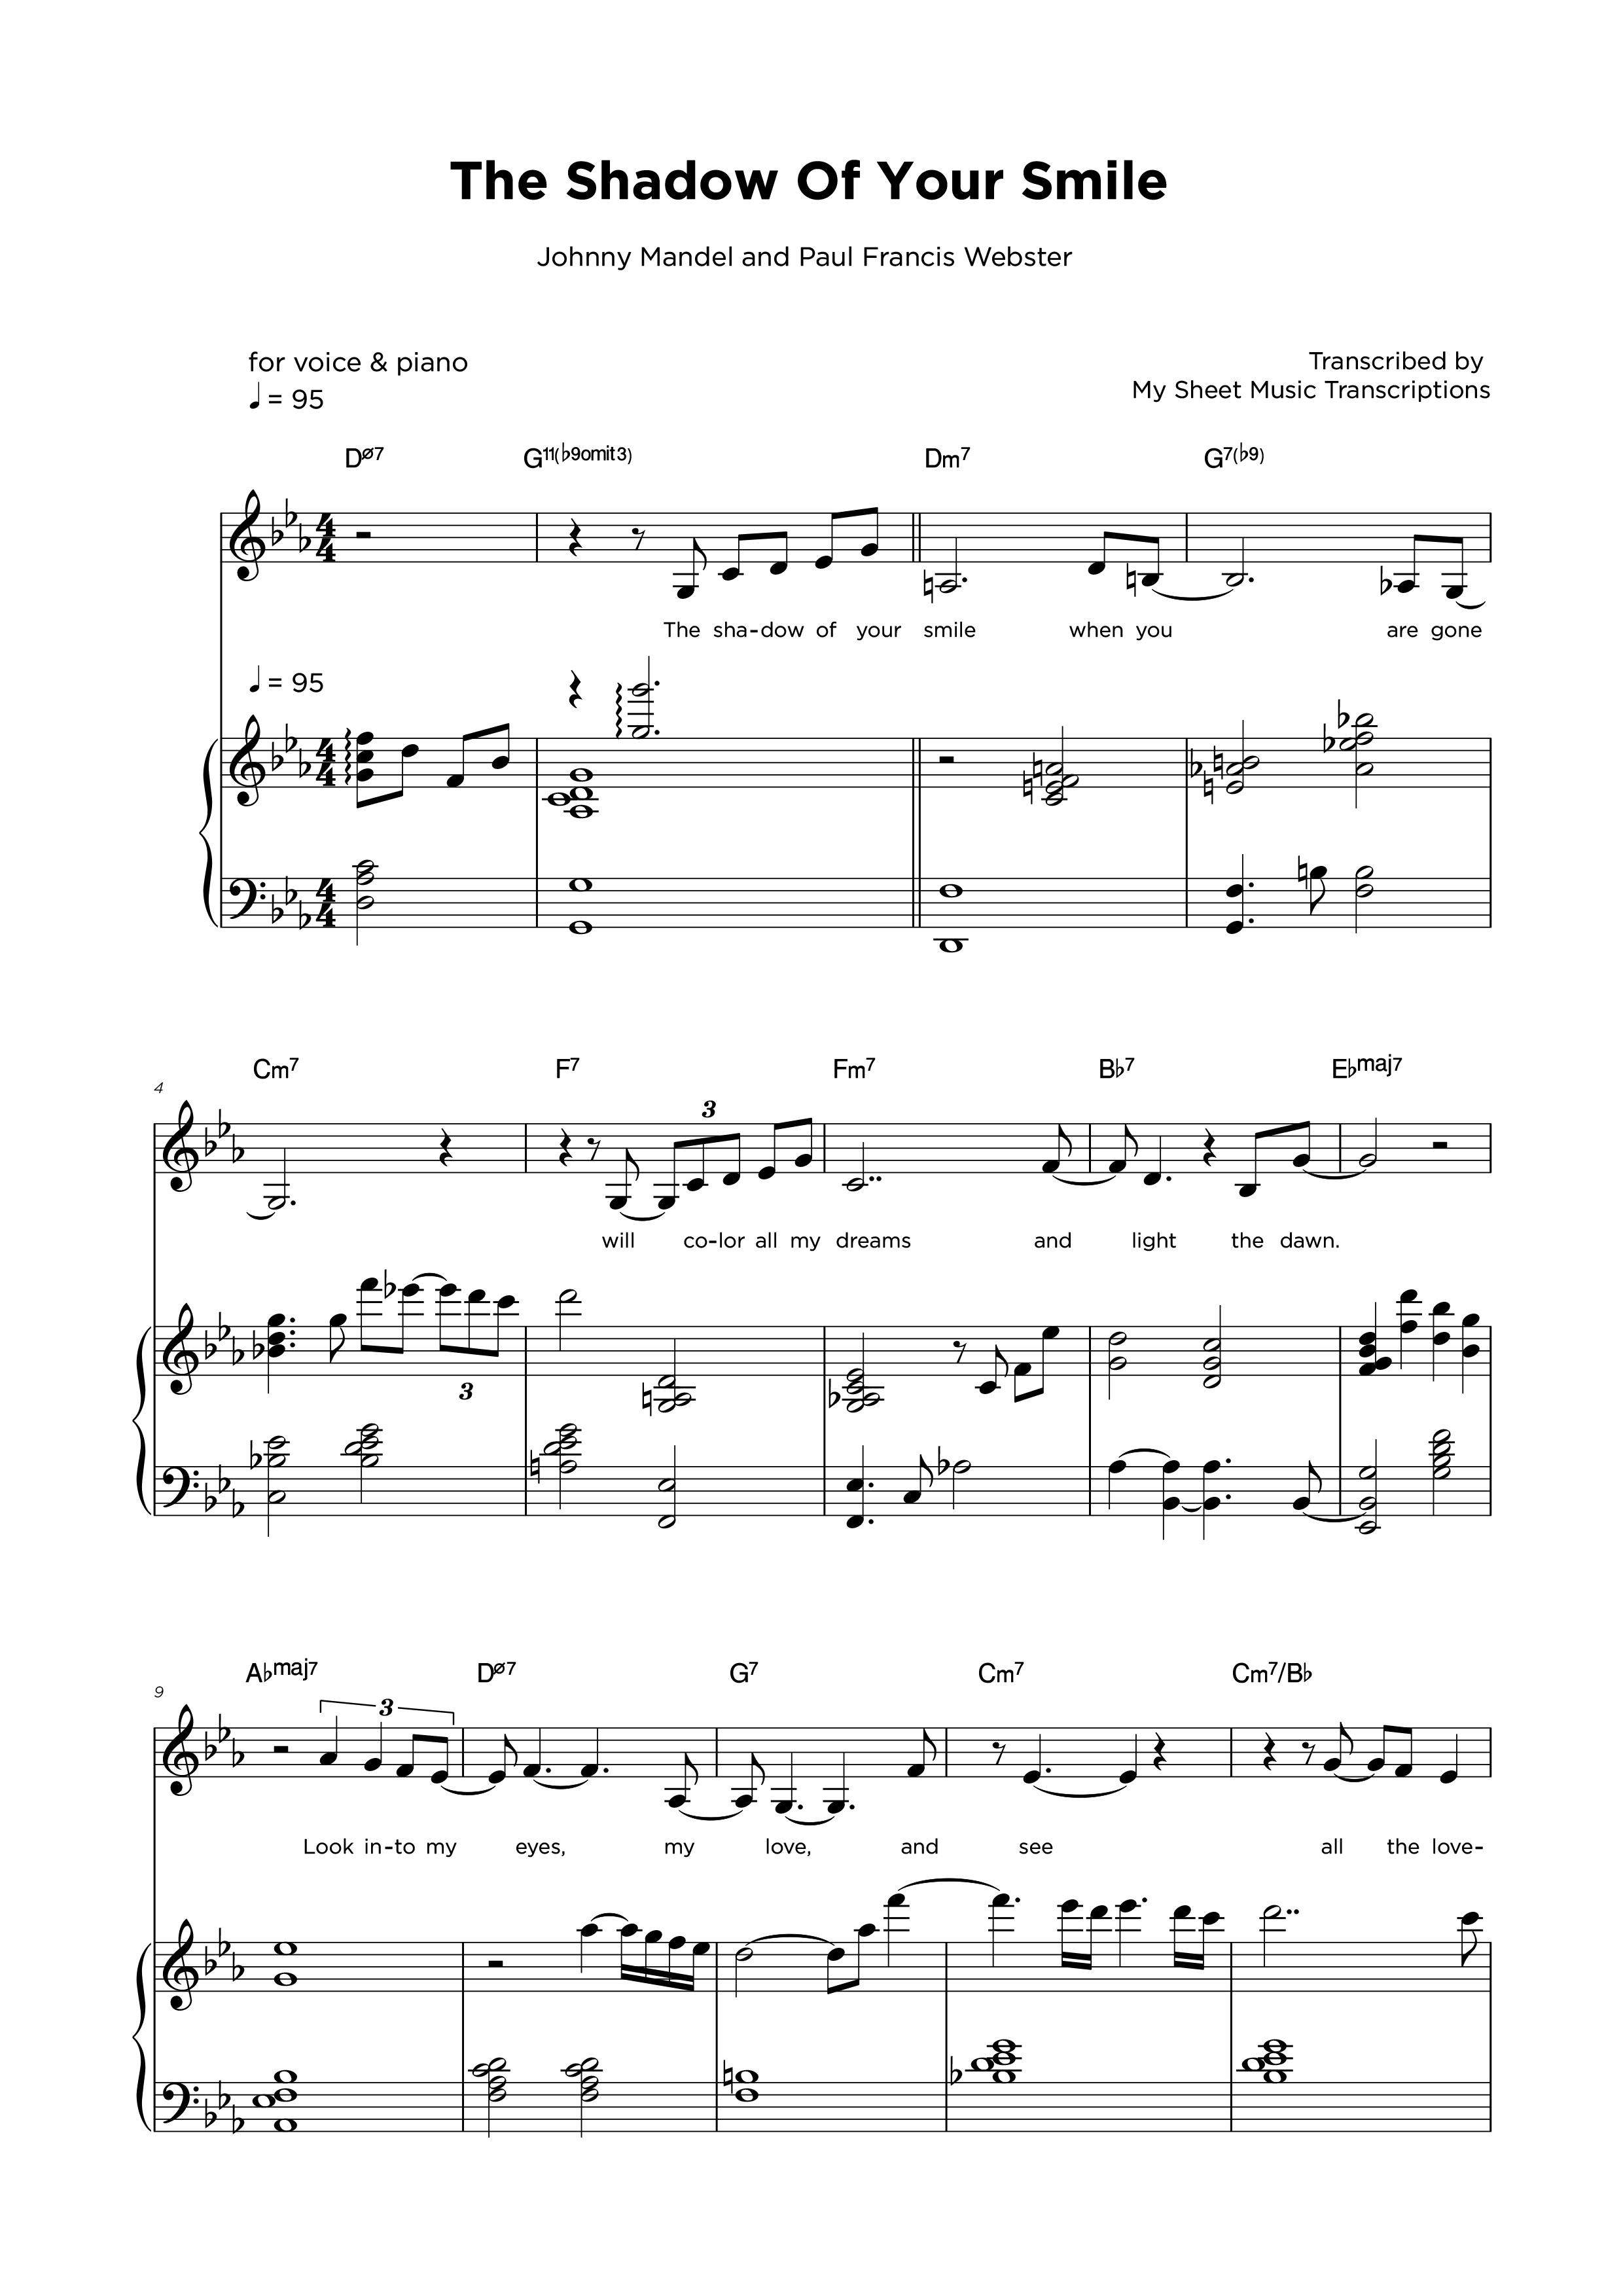 The Shadow of your smile - Partitura para piano y vocal